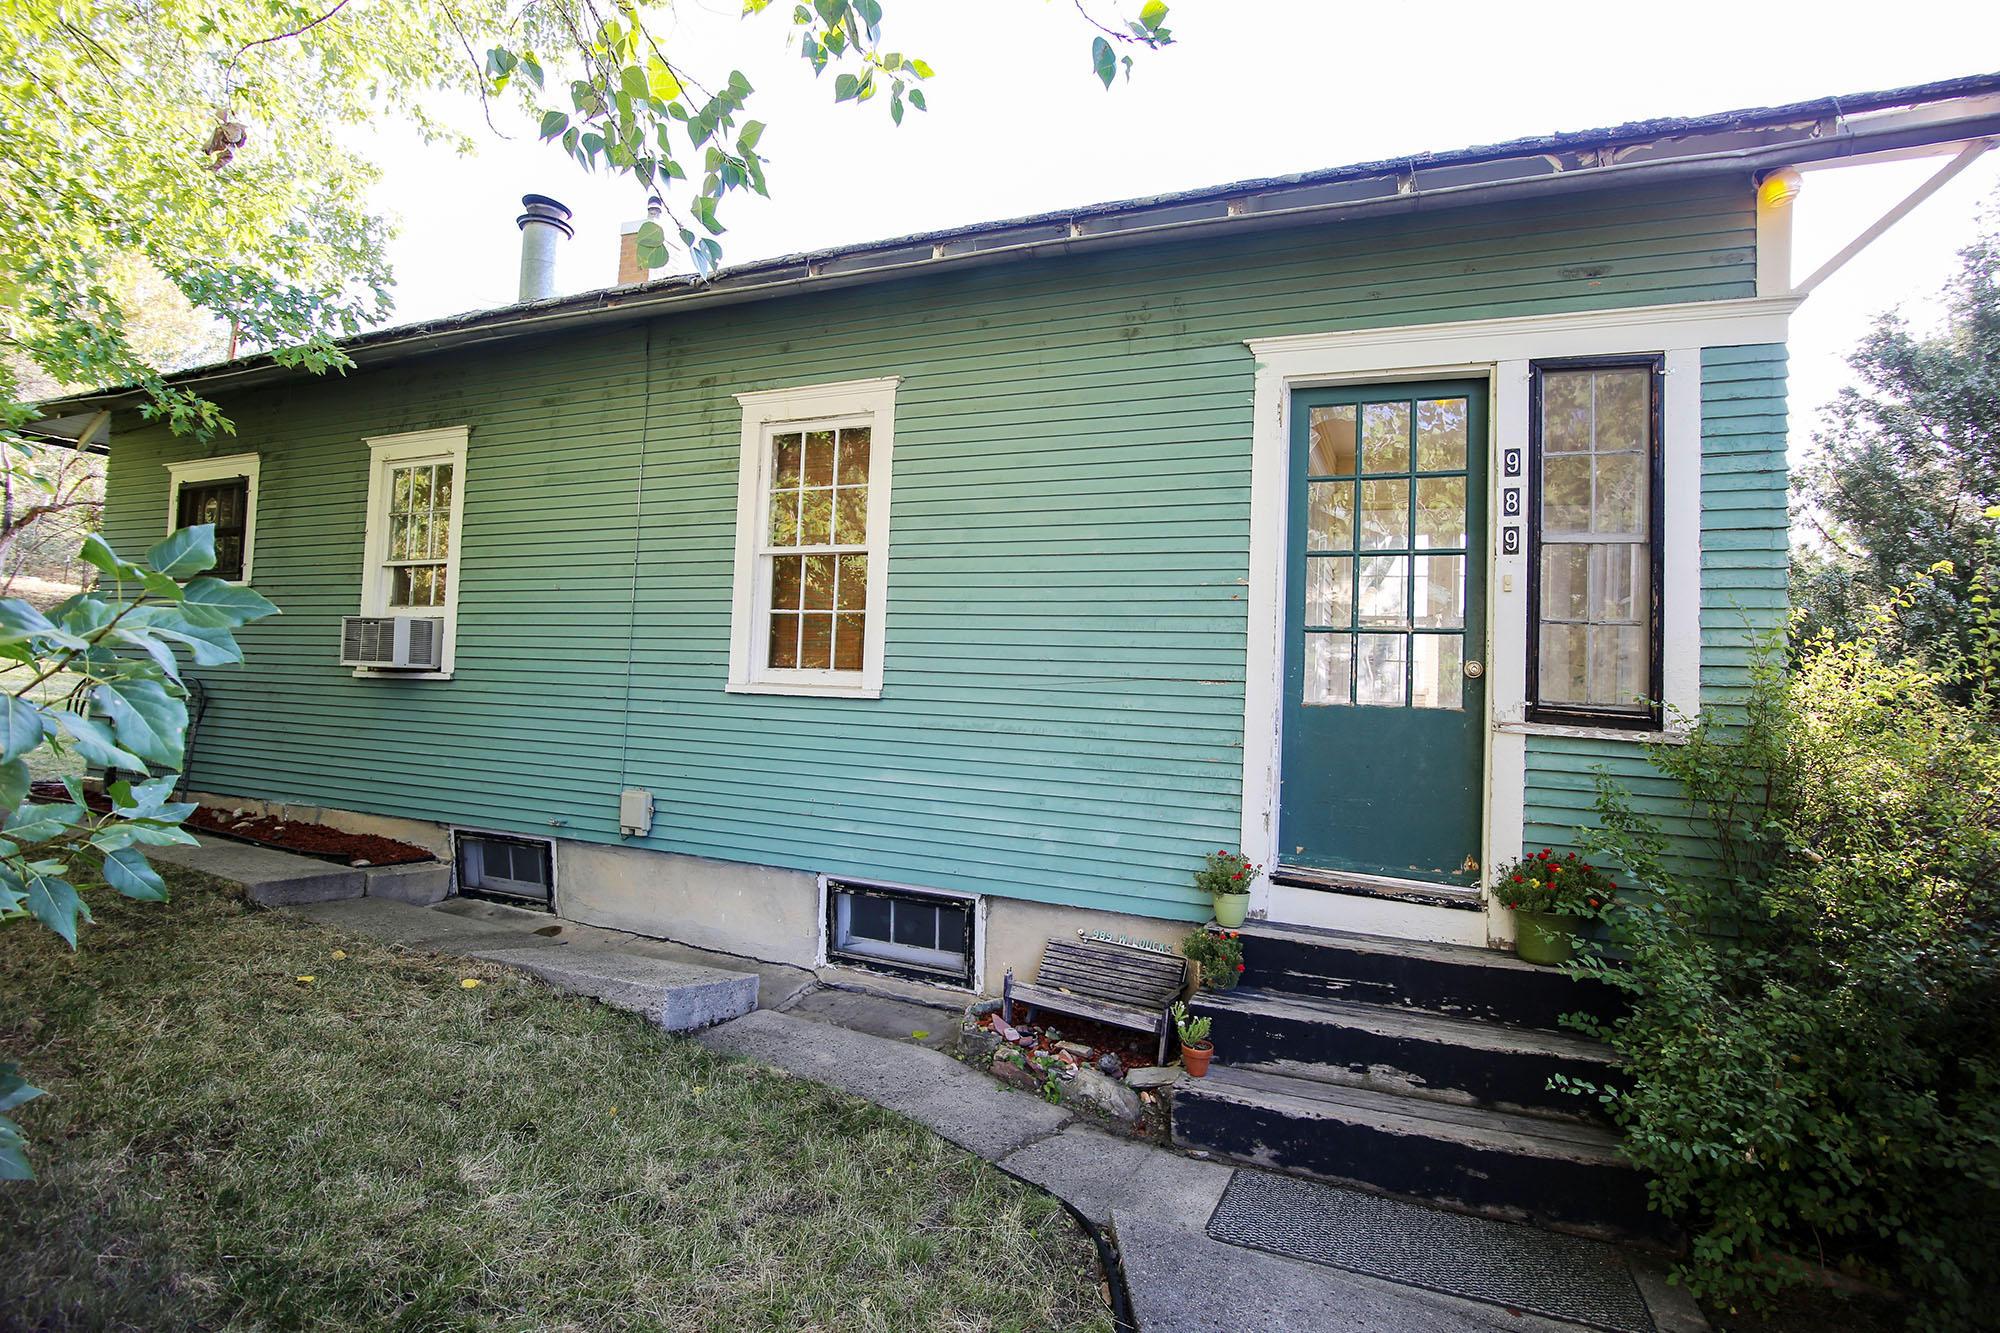 989 W Loucks Street, Sheridan, Wyoming 82801, 2 Bedrooms Bedrooms, ,1 BathroomBathrooms,Residential,For Sale,Loucks,18-970